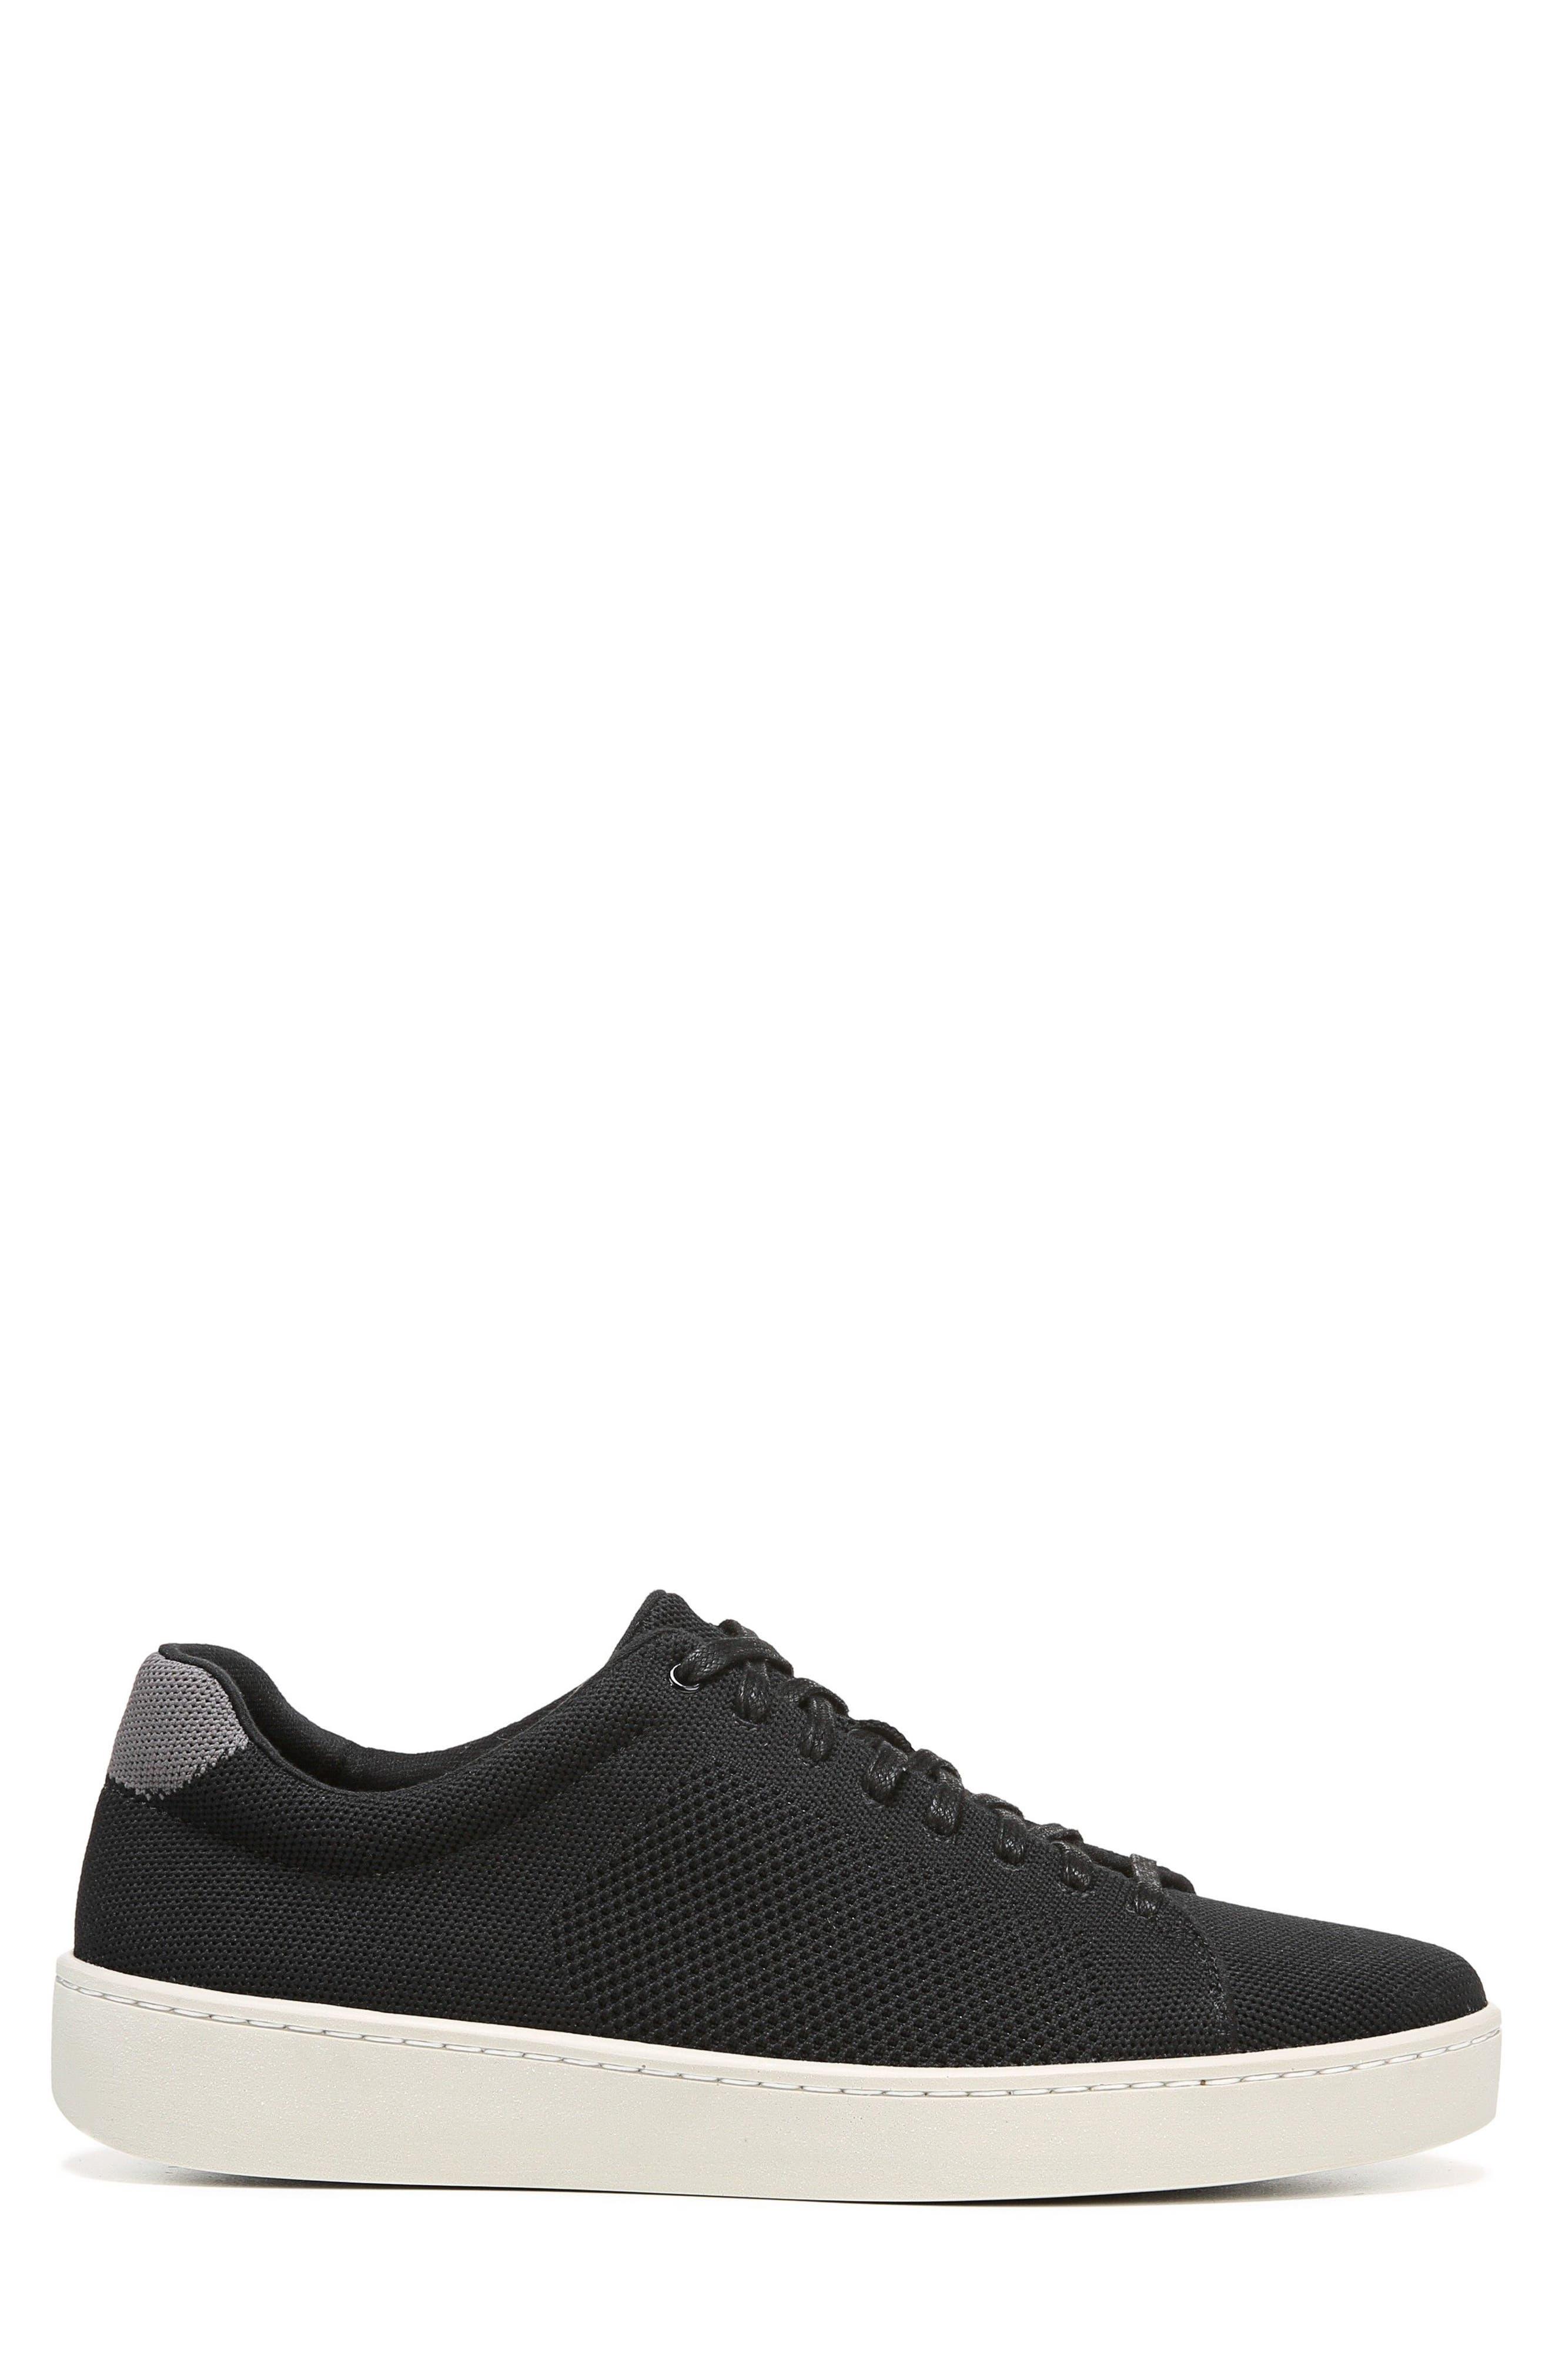 Silos Knit Low Top Sneaker,                             Alternate thumbnail 3, color,                             Black/ Graphite